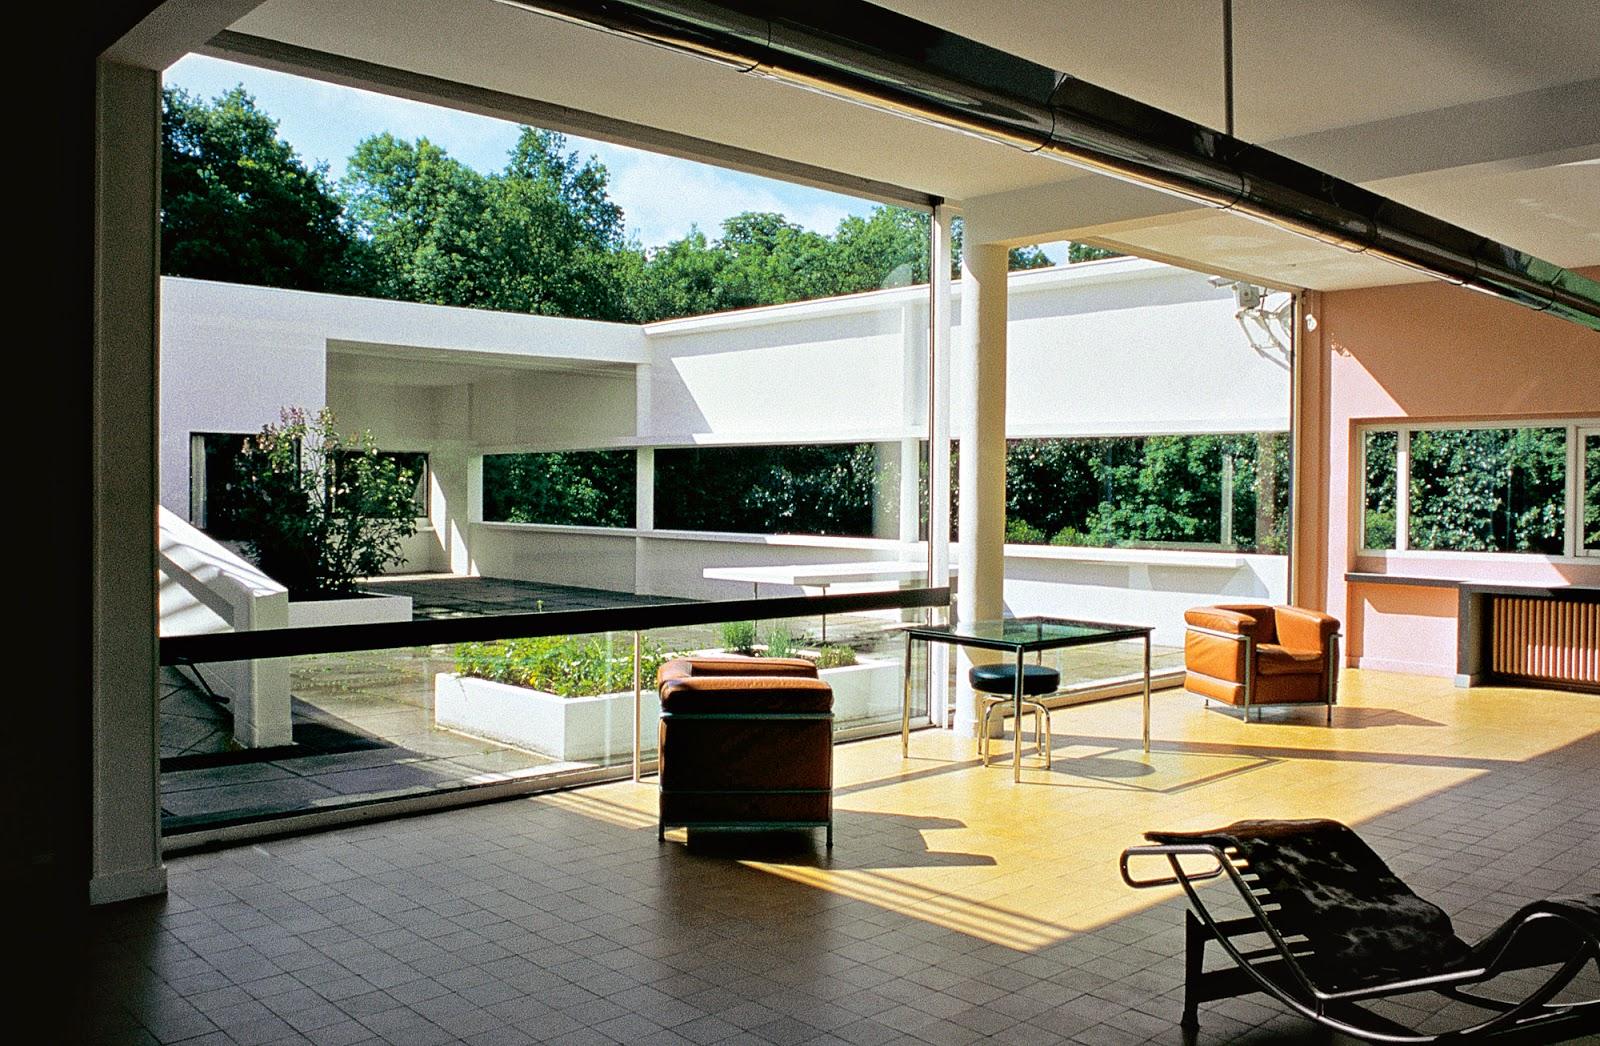 ecomanta le corbusier villa savoye france 39 s modern. Black Bedroom Furniture Sets. Home Design Ideas